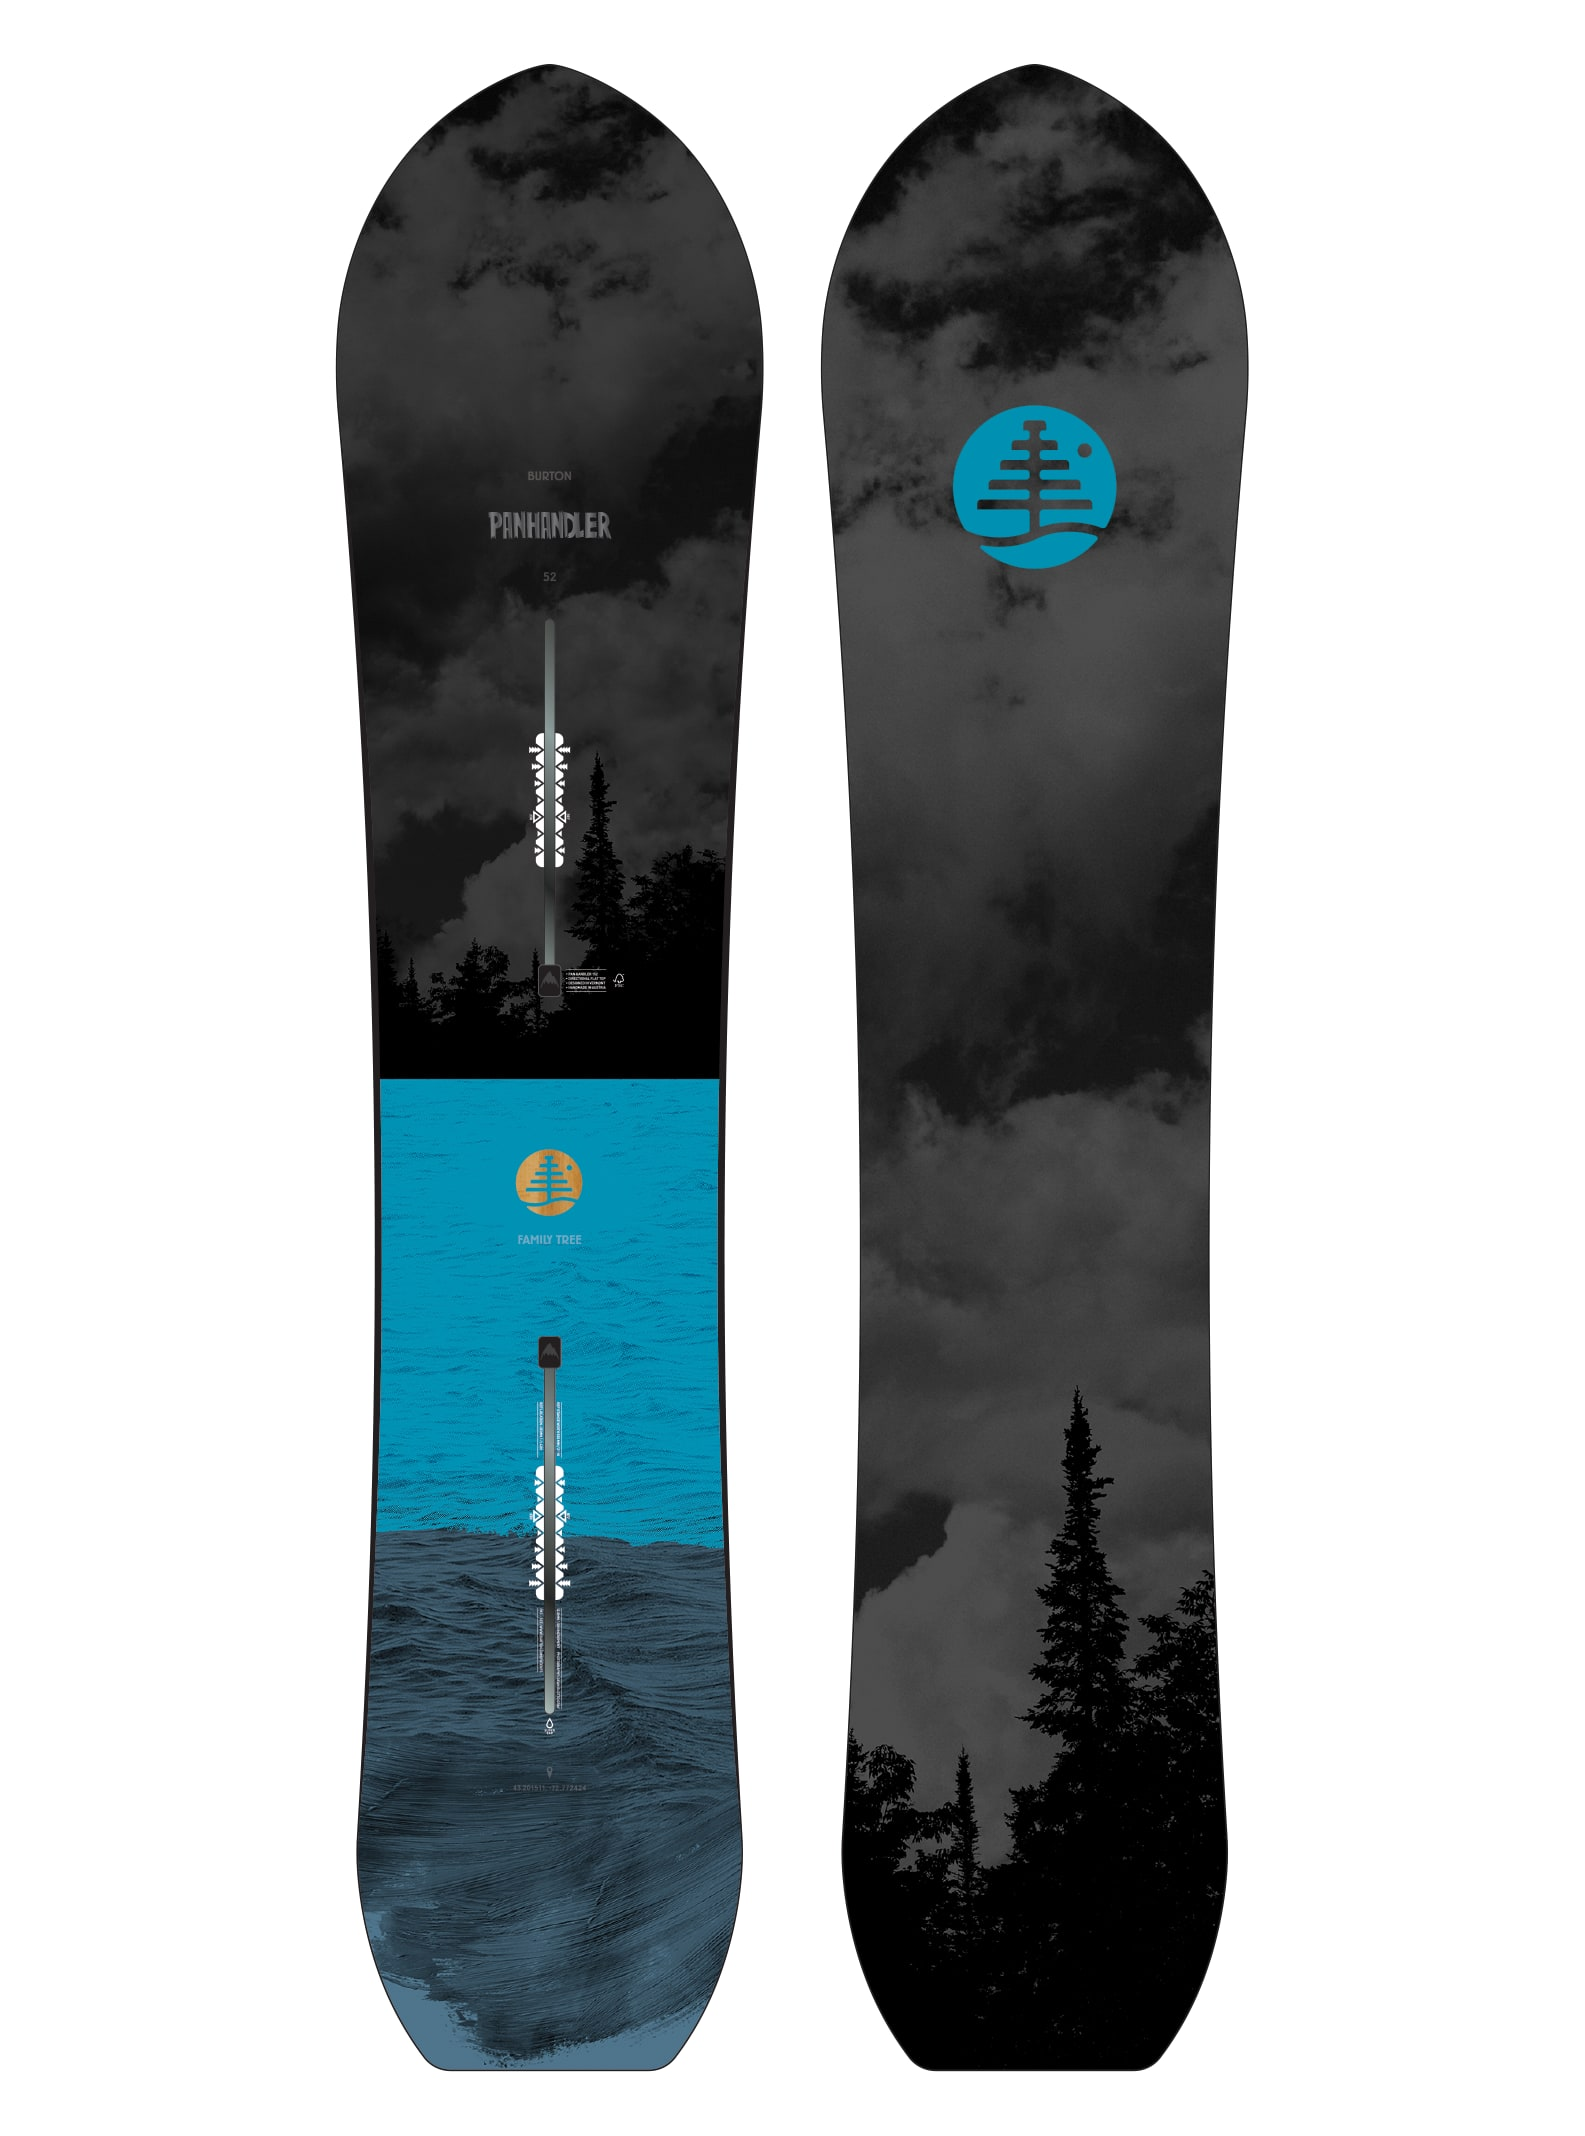 Men's Burton Family Tree Panhandler Snowboard   Burton Snowboards Winter 2018